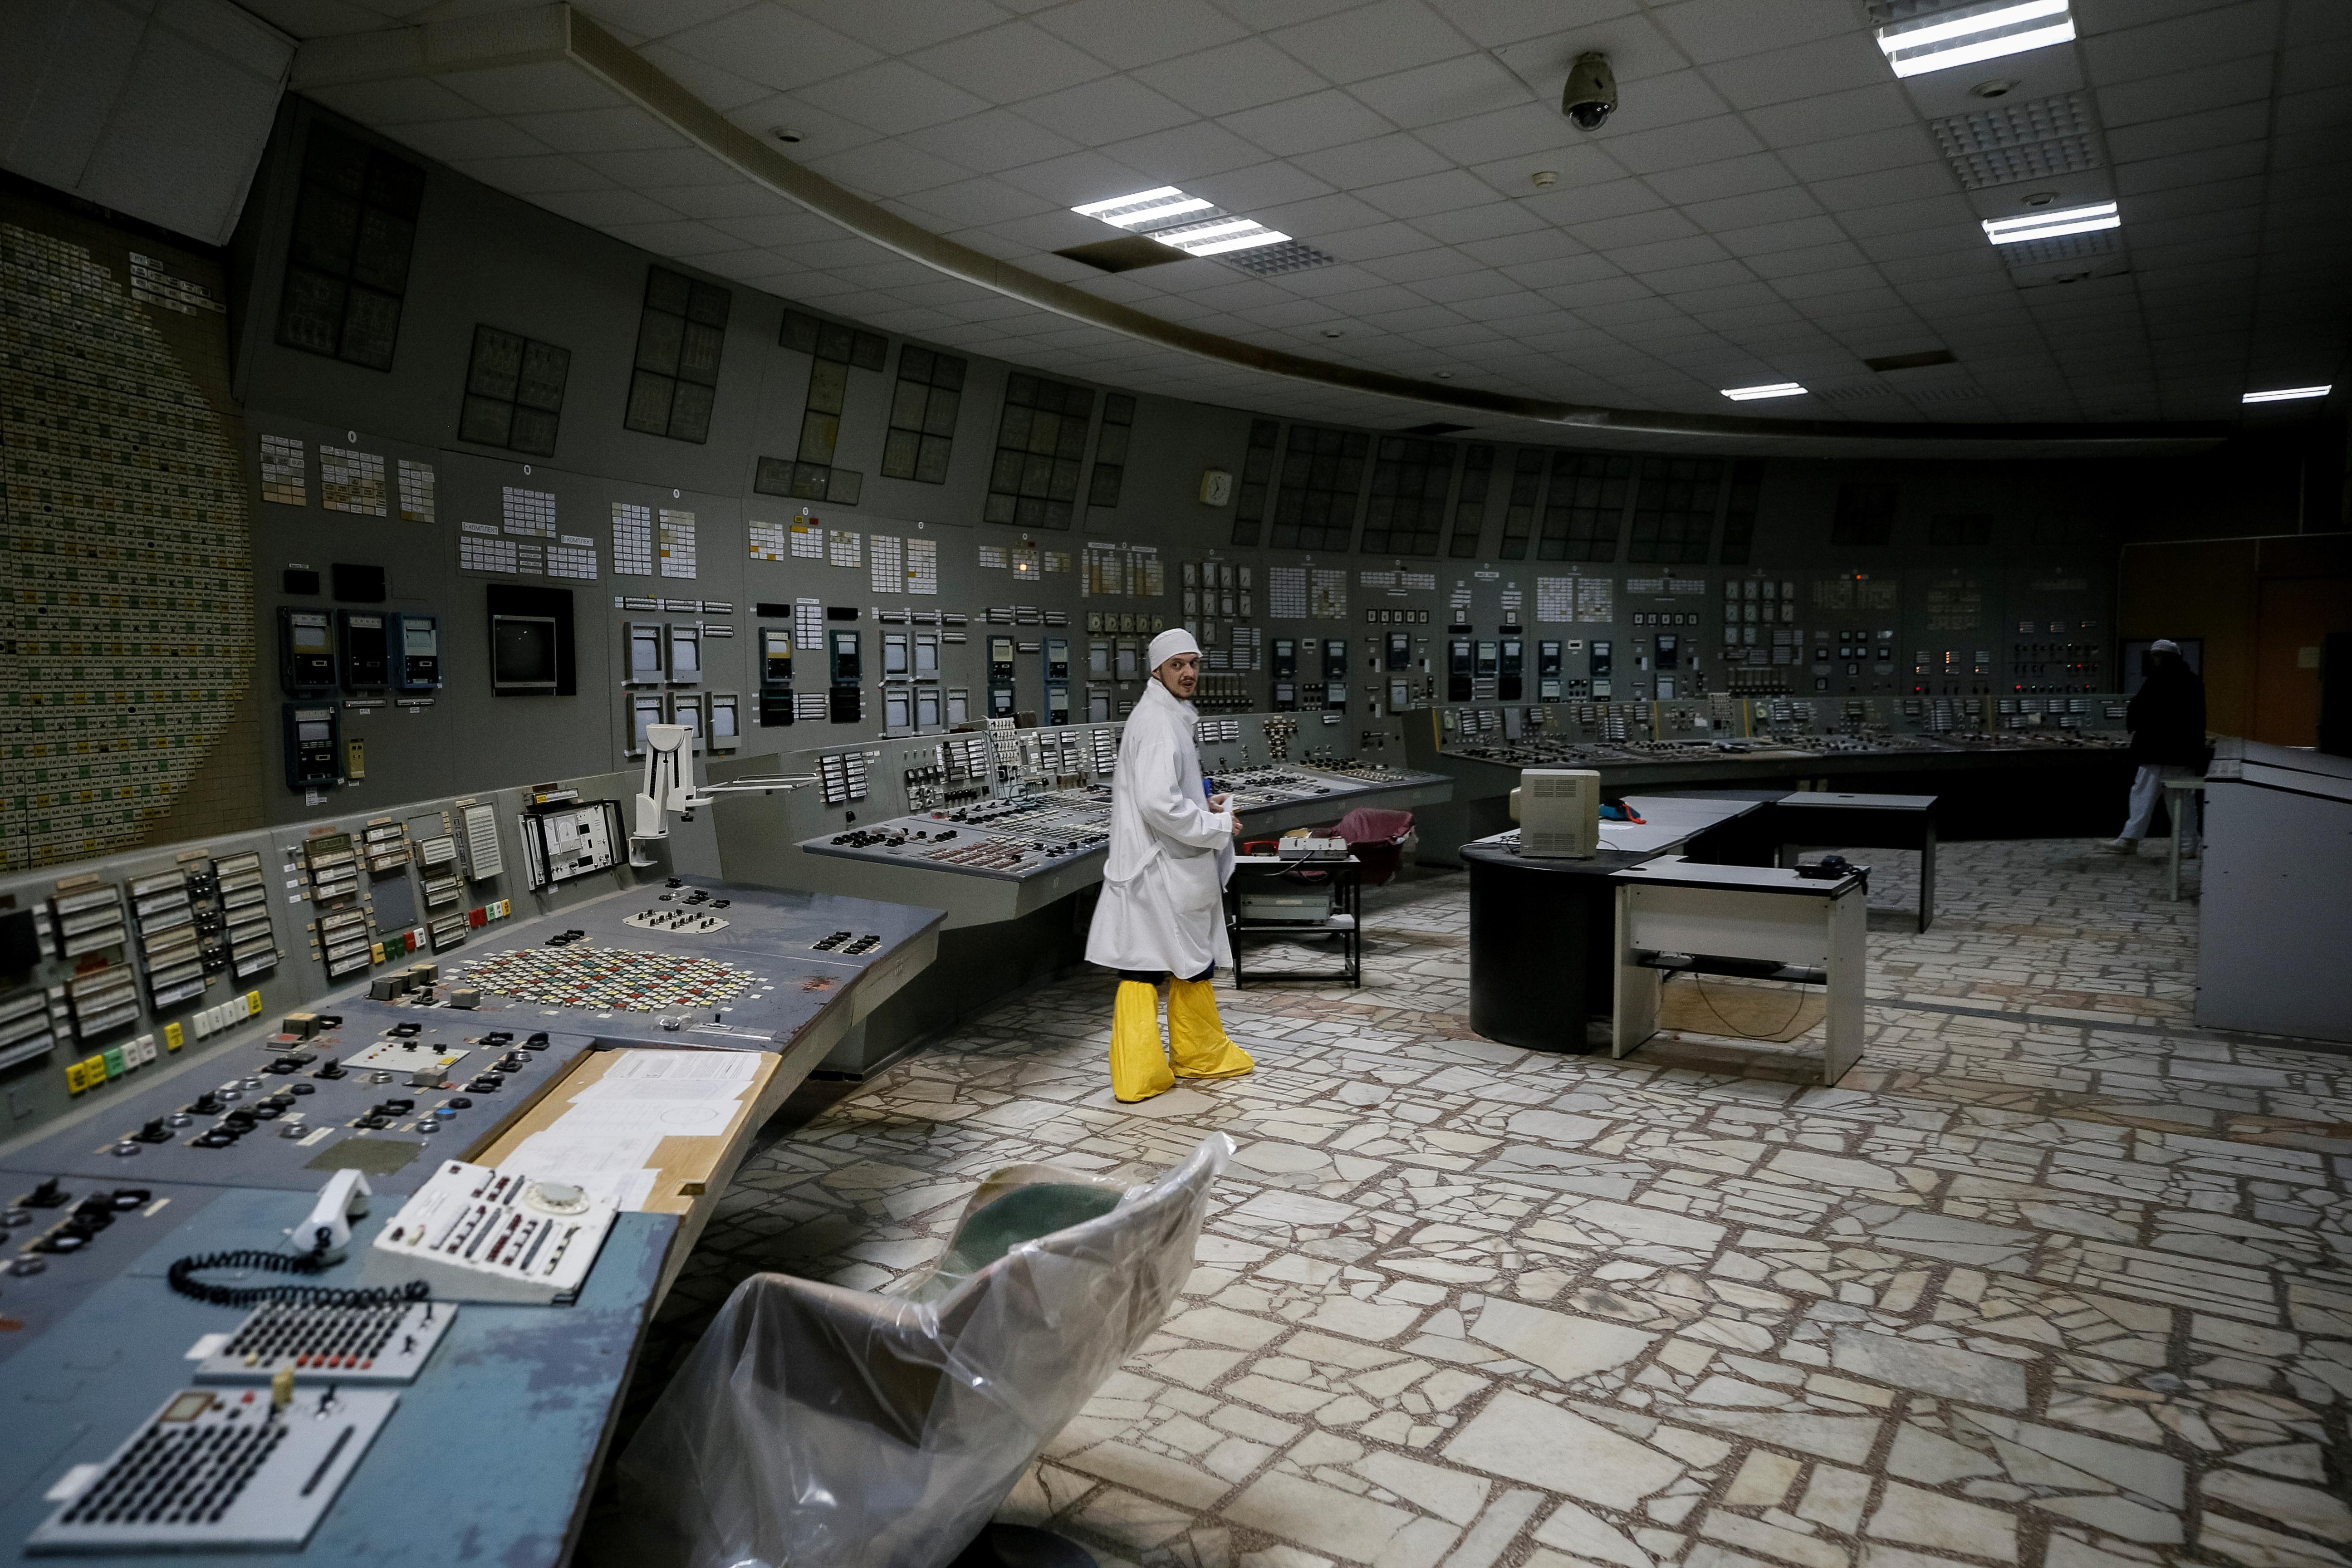 Meet Anatoly Dyatlov: The Man Behind The Chernobyl Nuclear ... |Chernobyl Reactor Meltdown